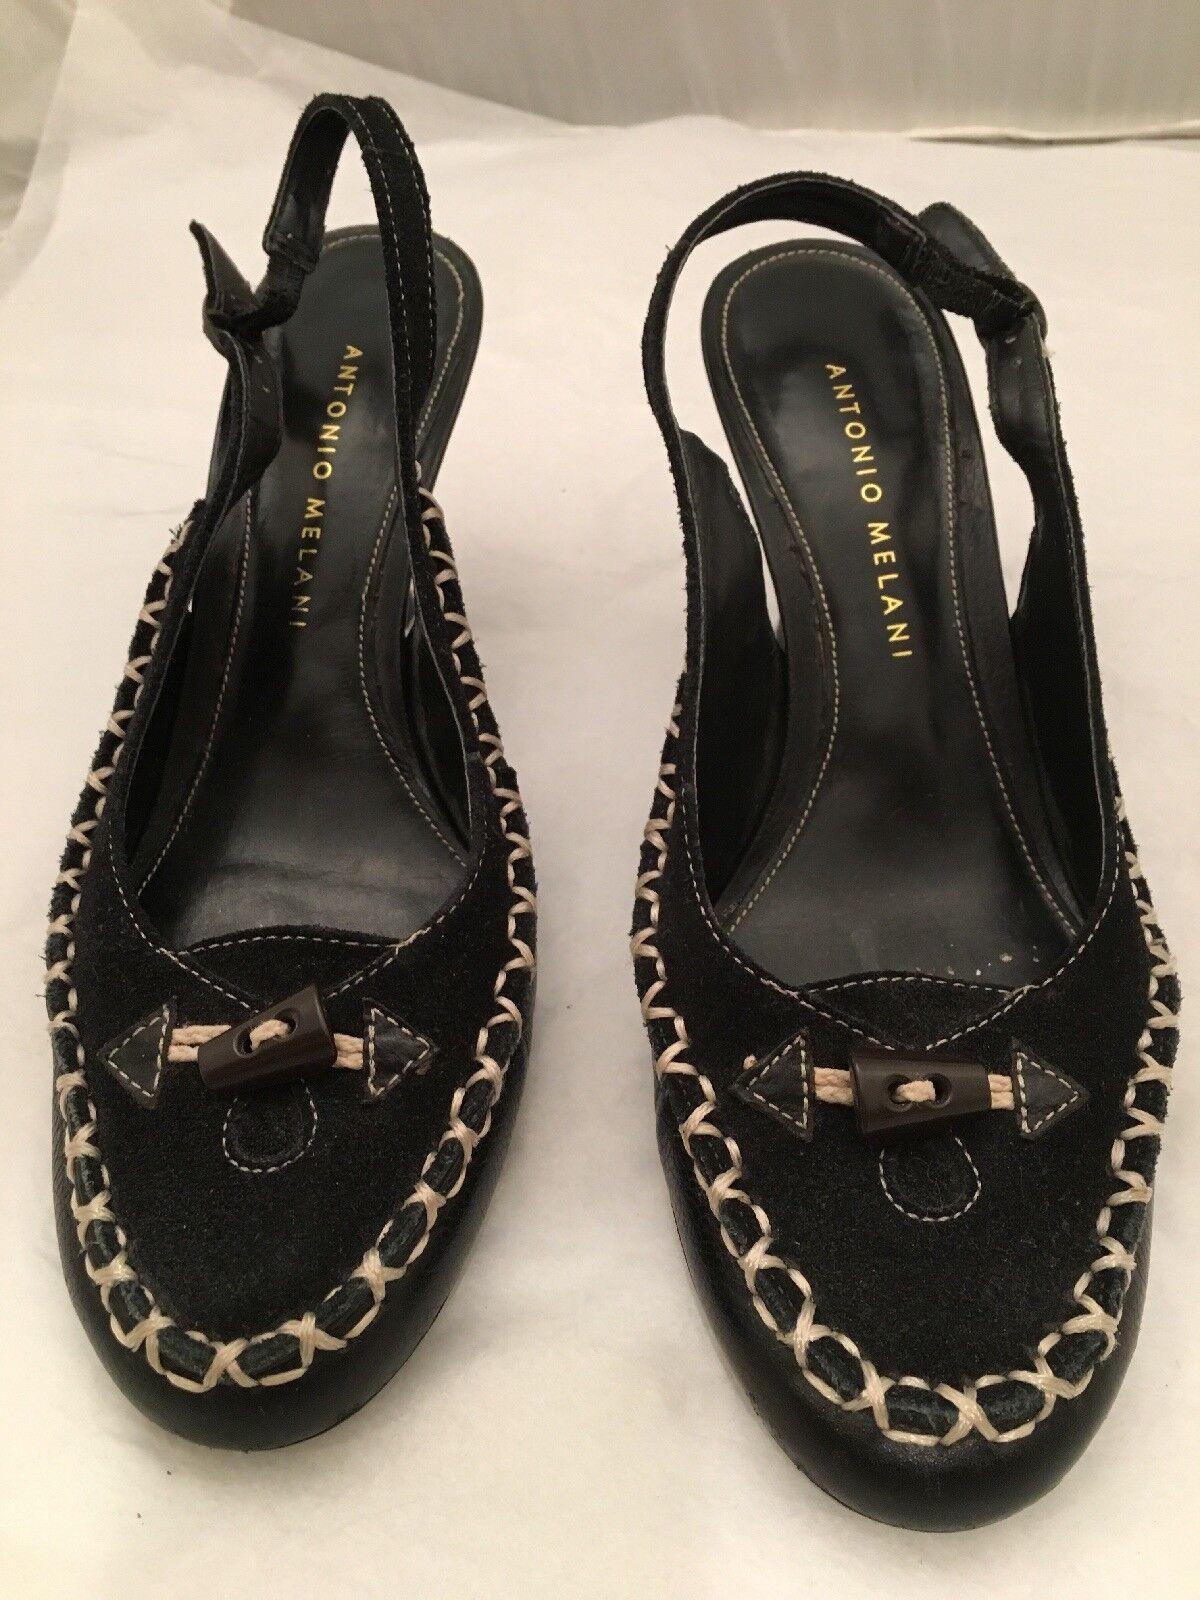 Shoes, ANTONIO MELANI, black, sling back, closed toes, 3 1/2